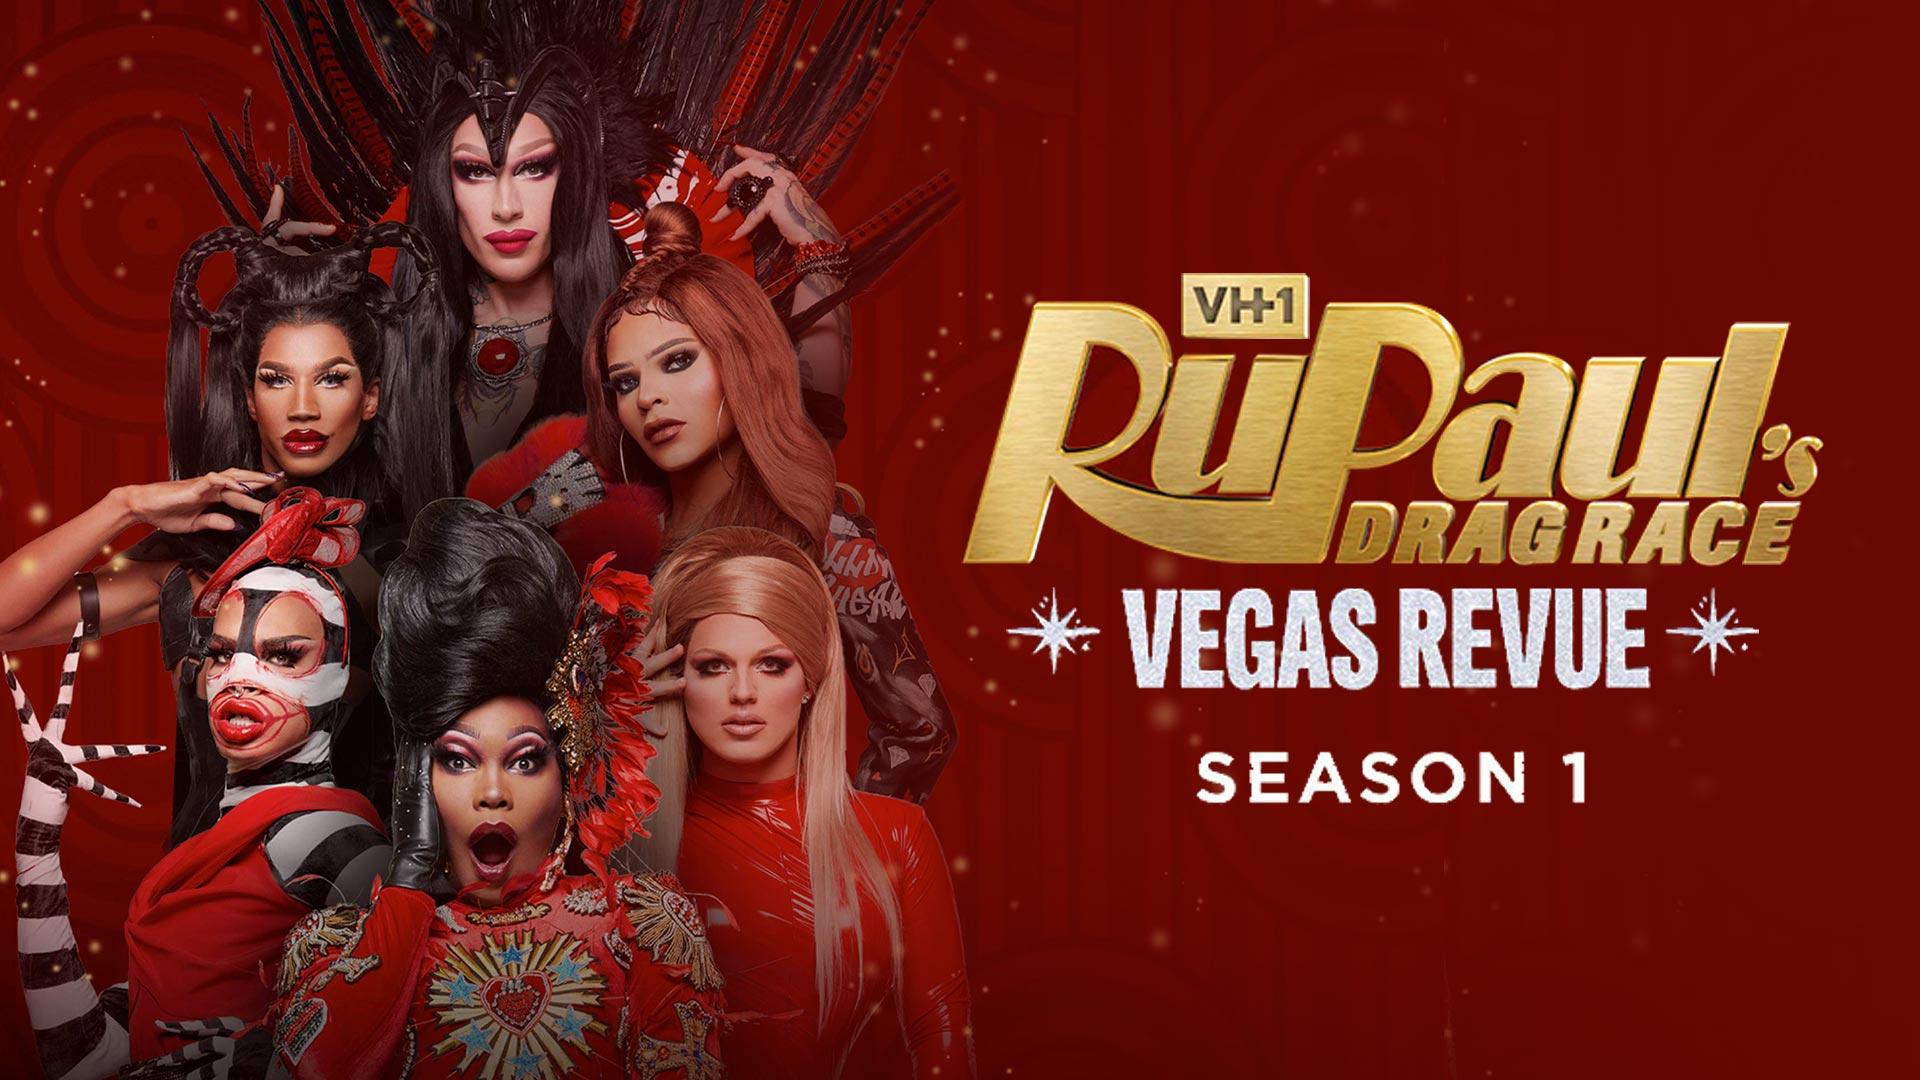 RuPaul's Drag Race: Vegas Revue Season 1